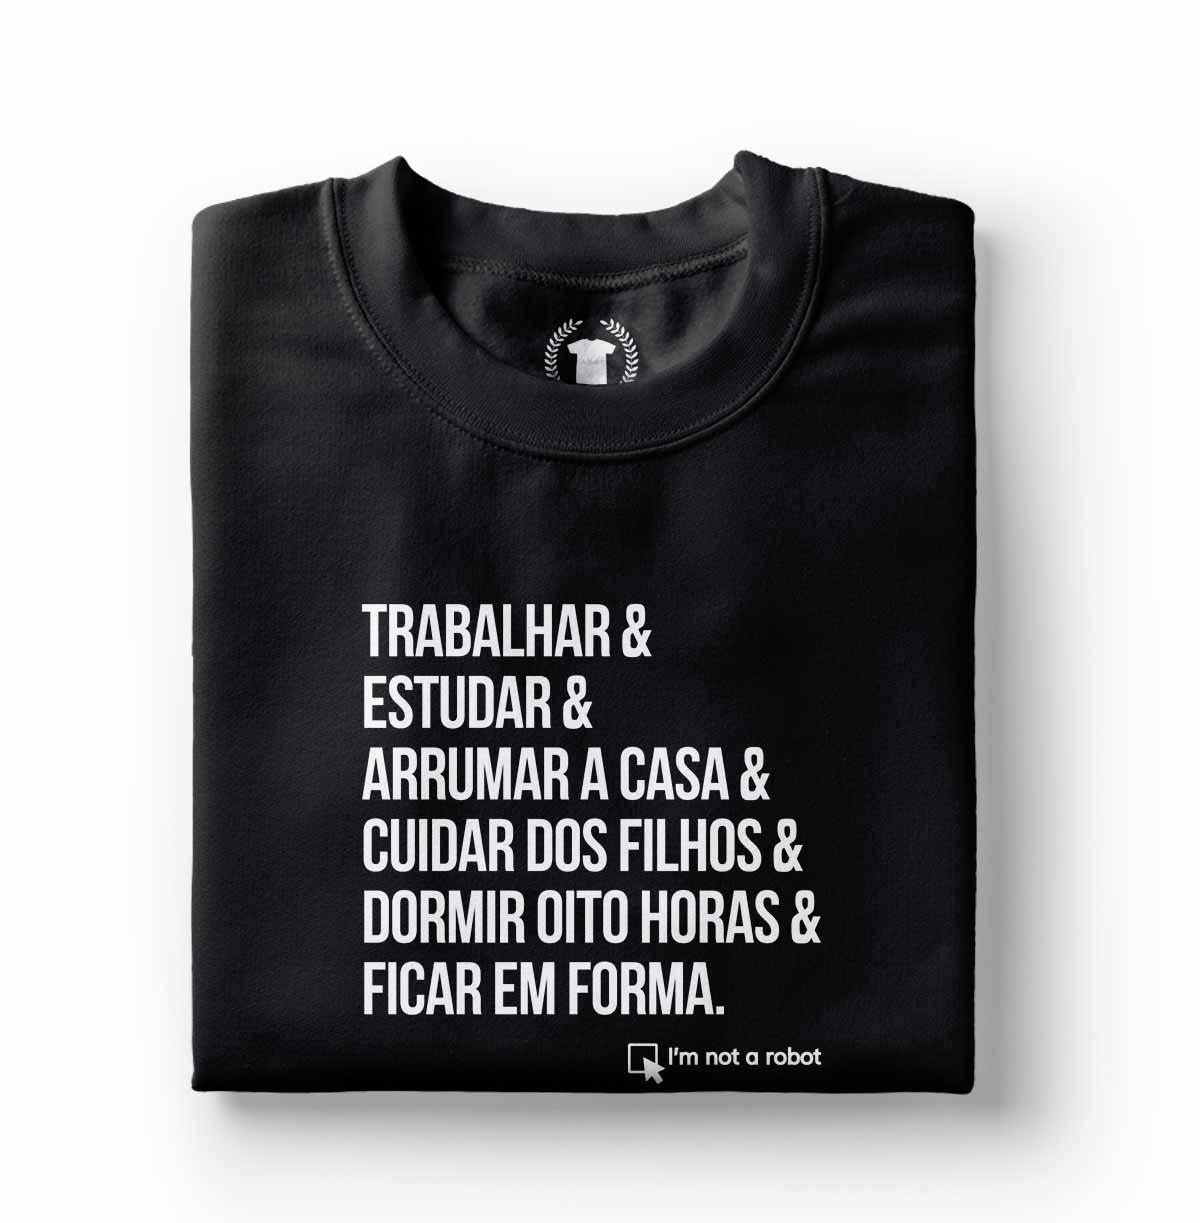 camisa camiseta feminina estampa divertida not a robot